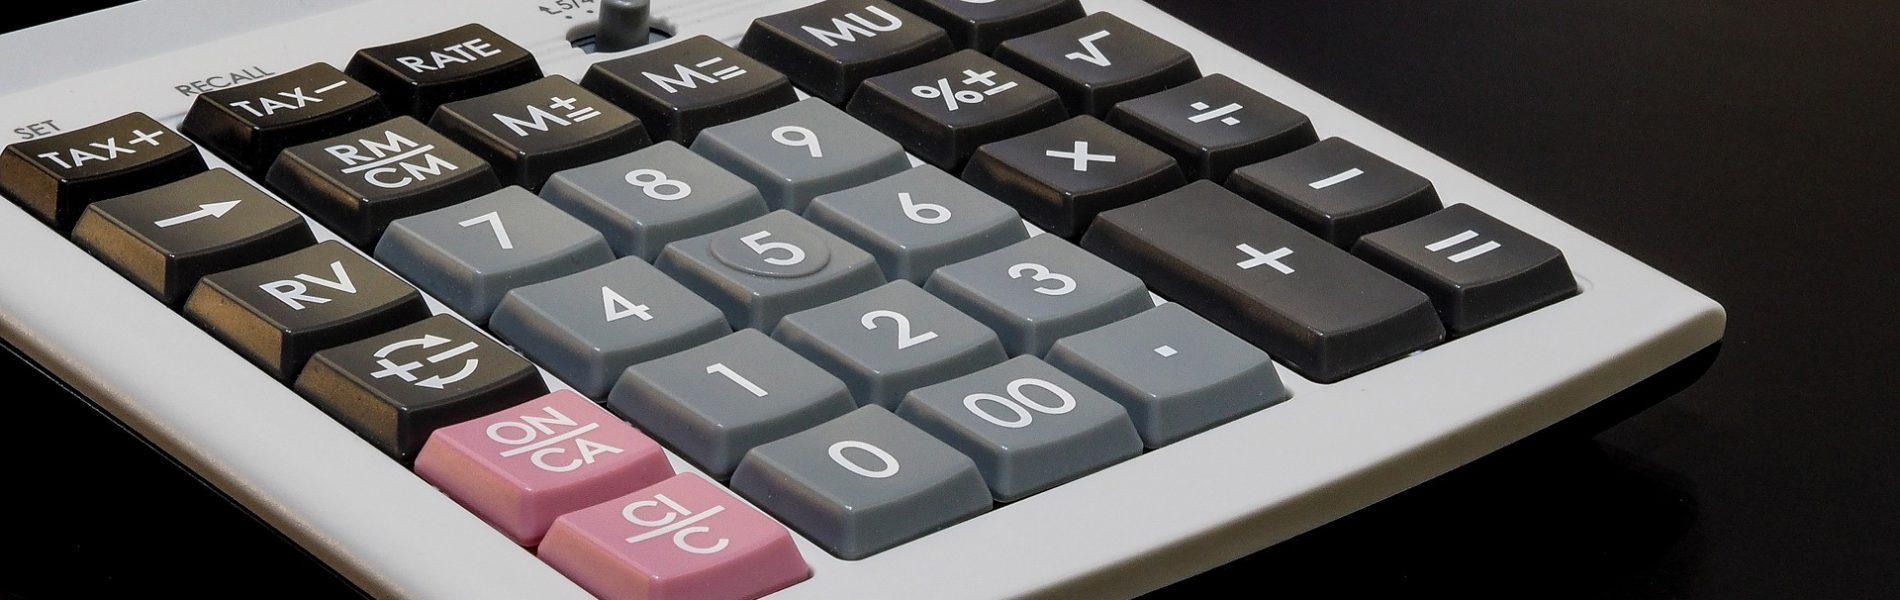 kalkulator obliczenia